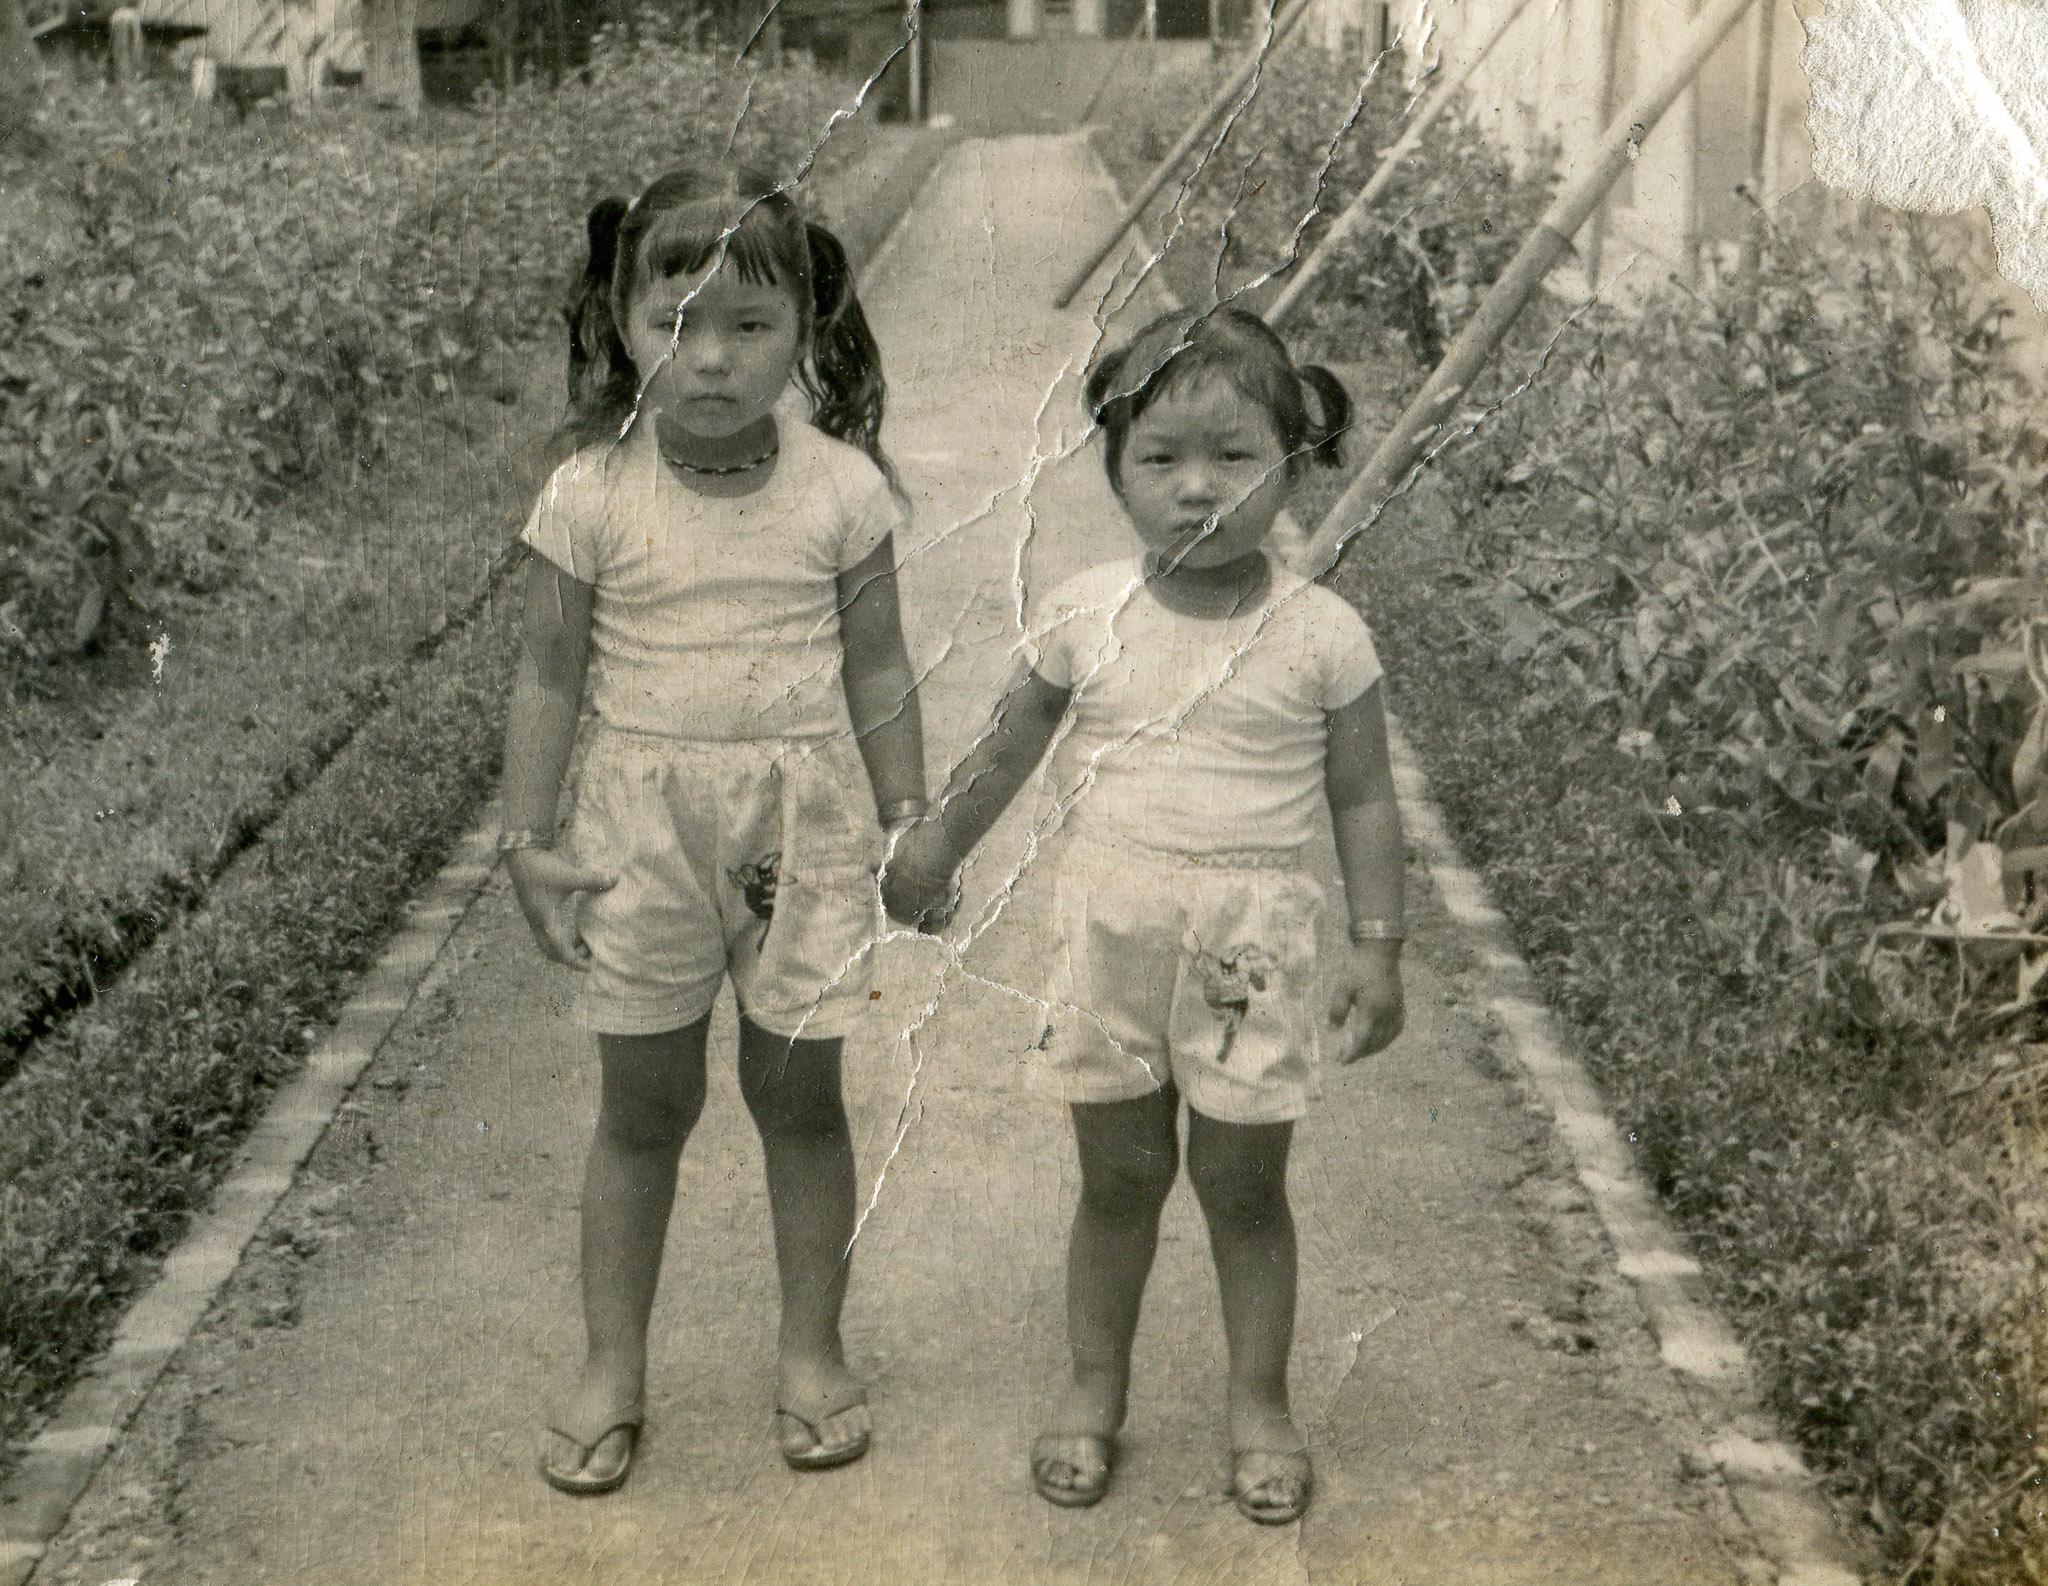 singapore-gurkhas-archive-photo-museum-zakaria-zainal-9.jpg